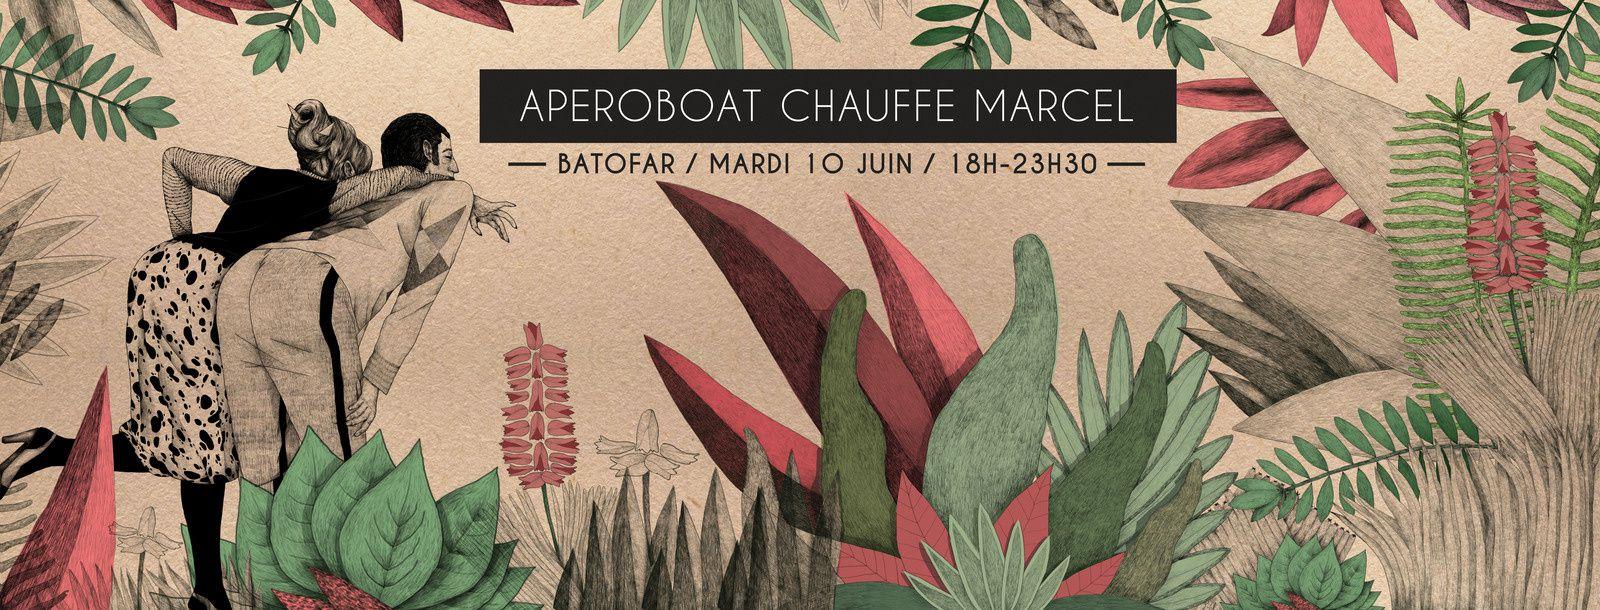 Aperoboat Chauffe Marcel - Batofar